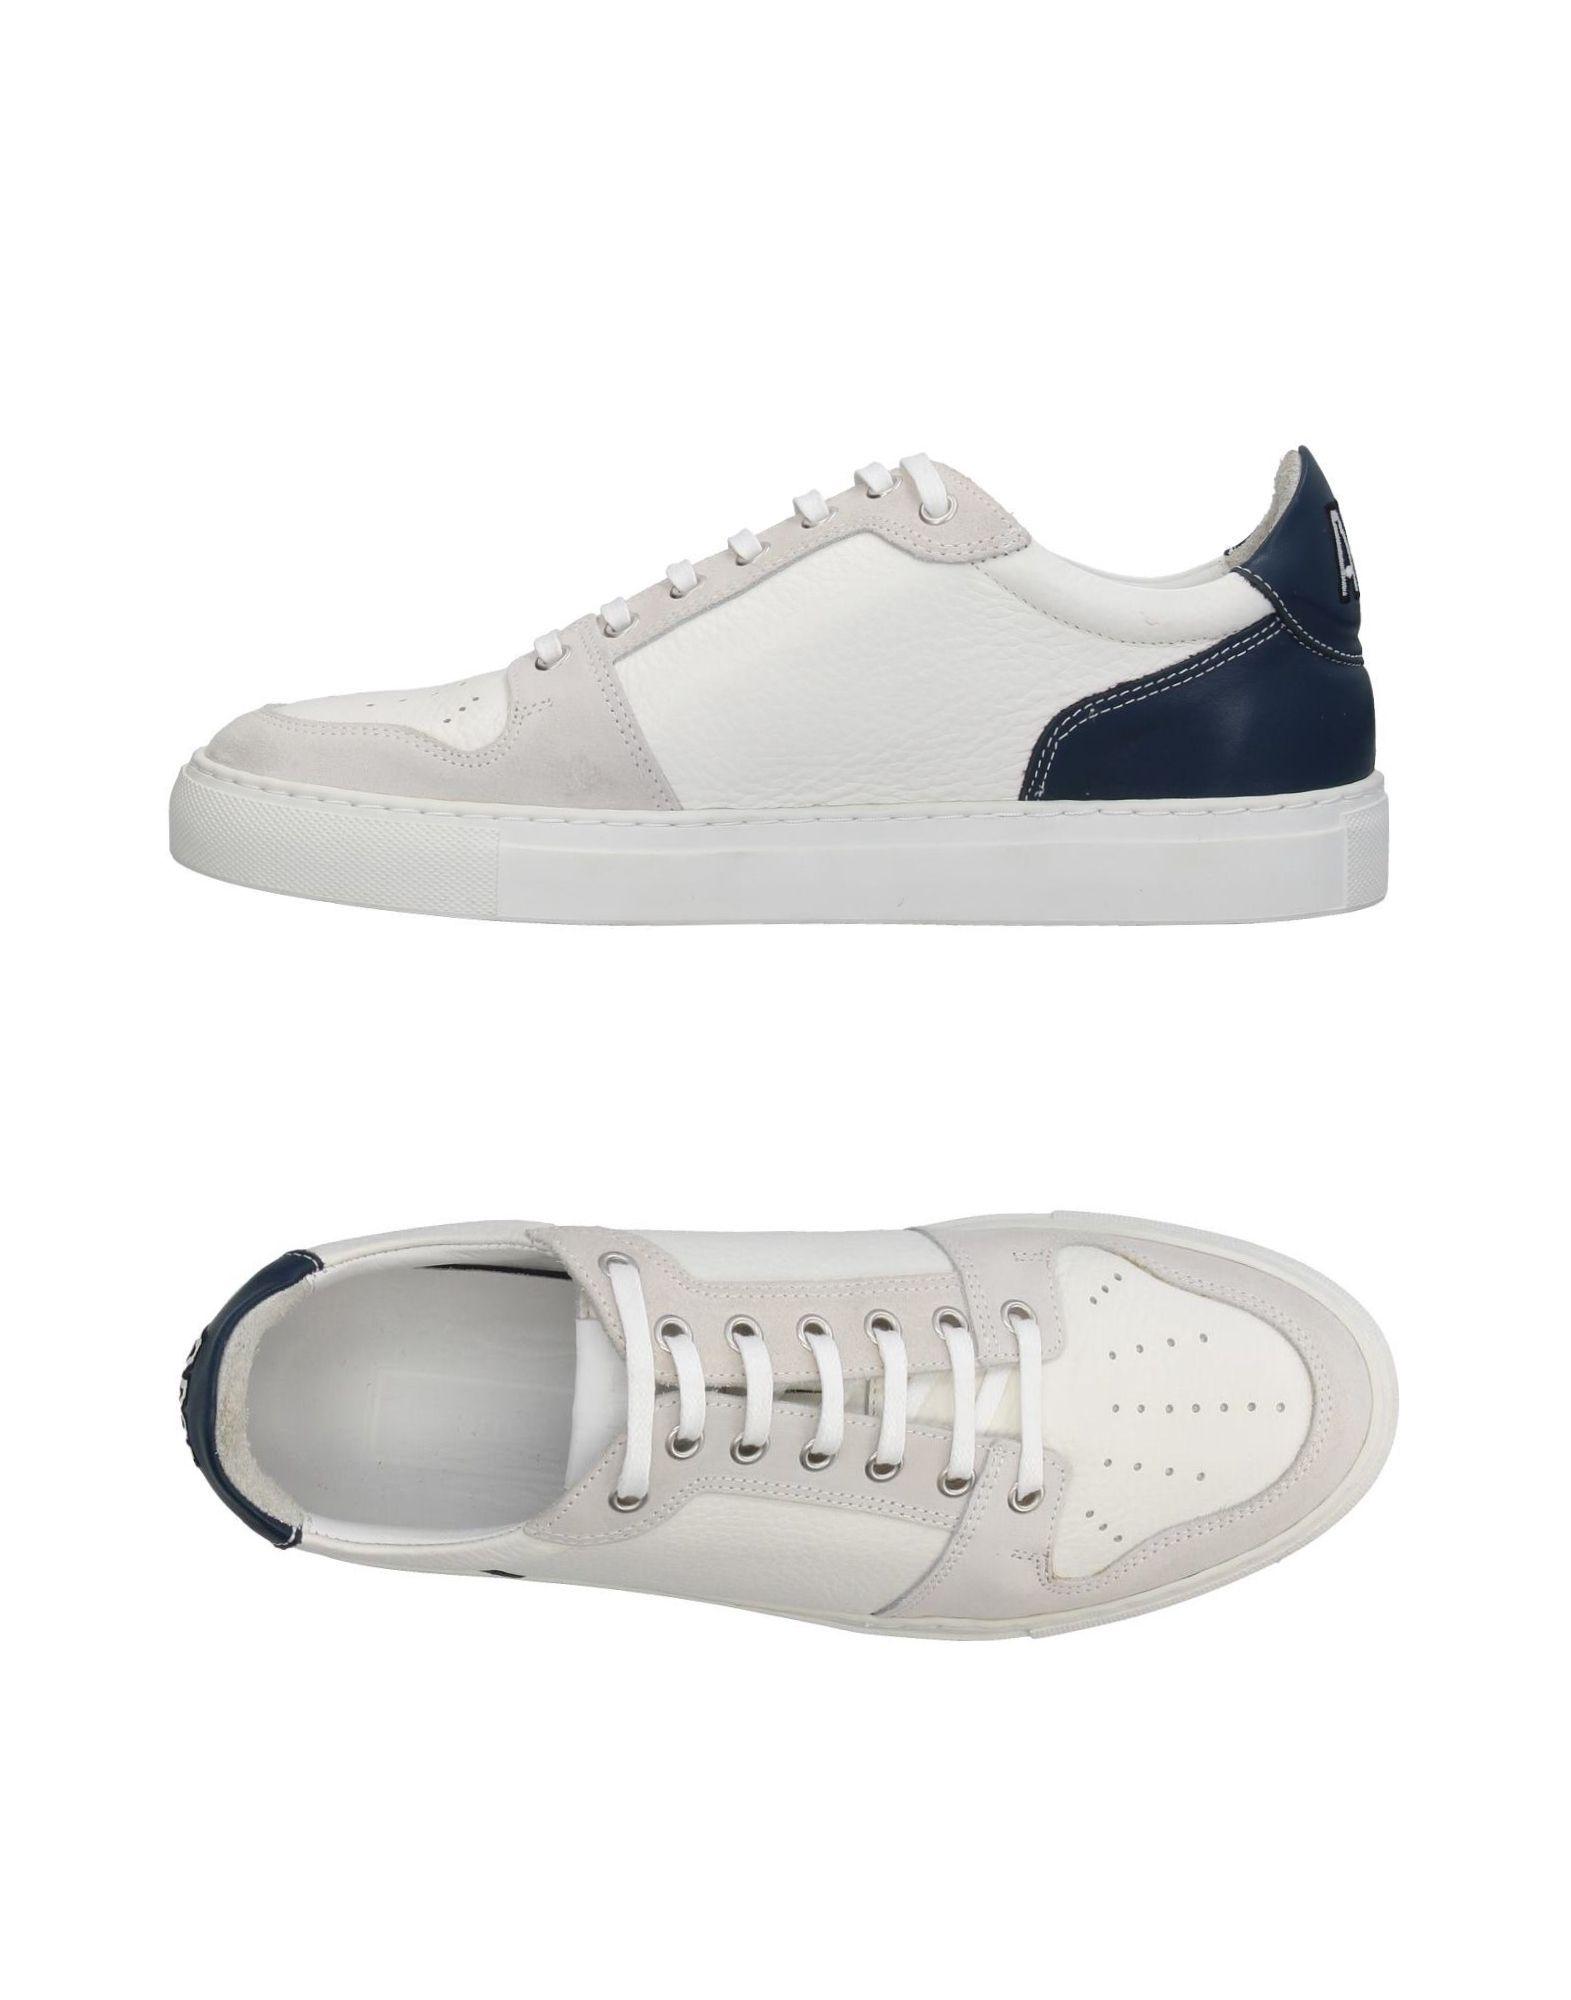 Ami Alexandre Mattiussi Sneakers Herren  11402715XN Gute Qualität beliebte Schuhe